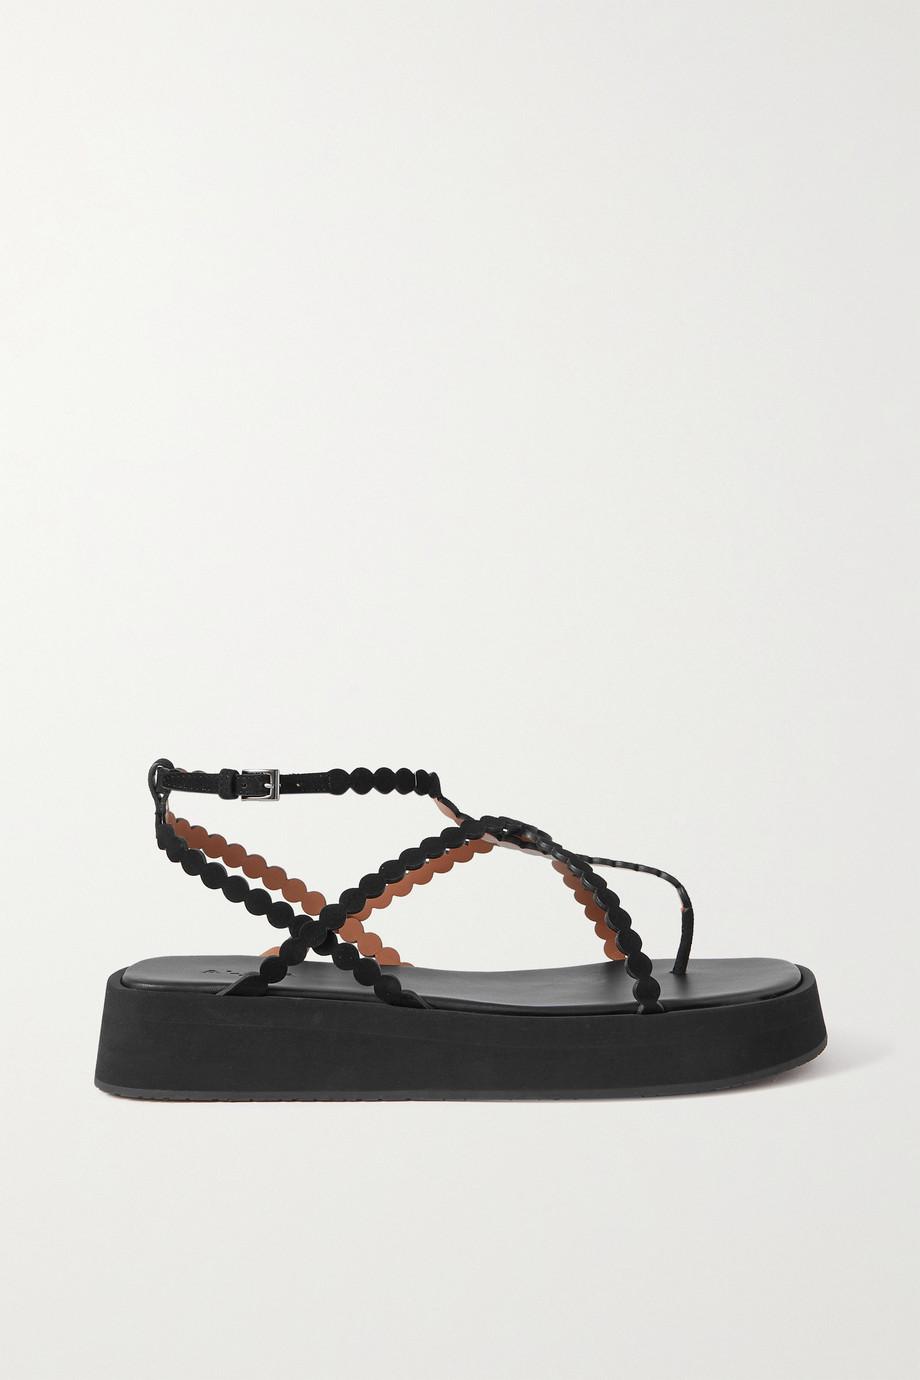 Alaïa 40 laser-cut suede platform sandals